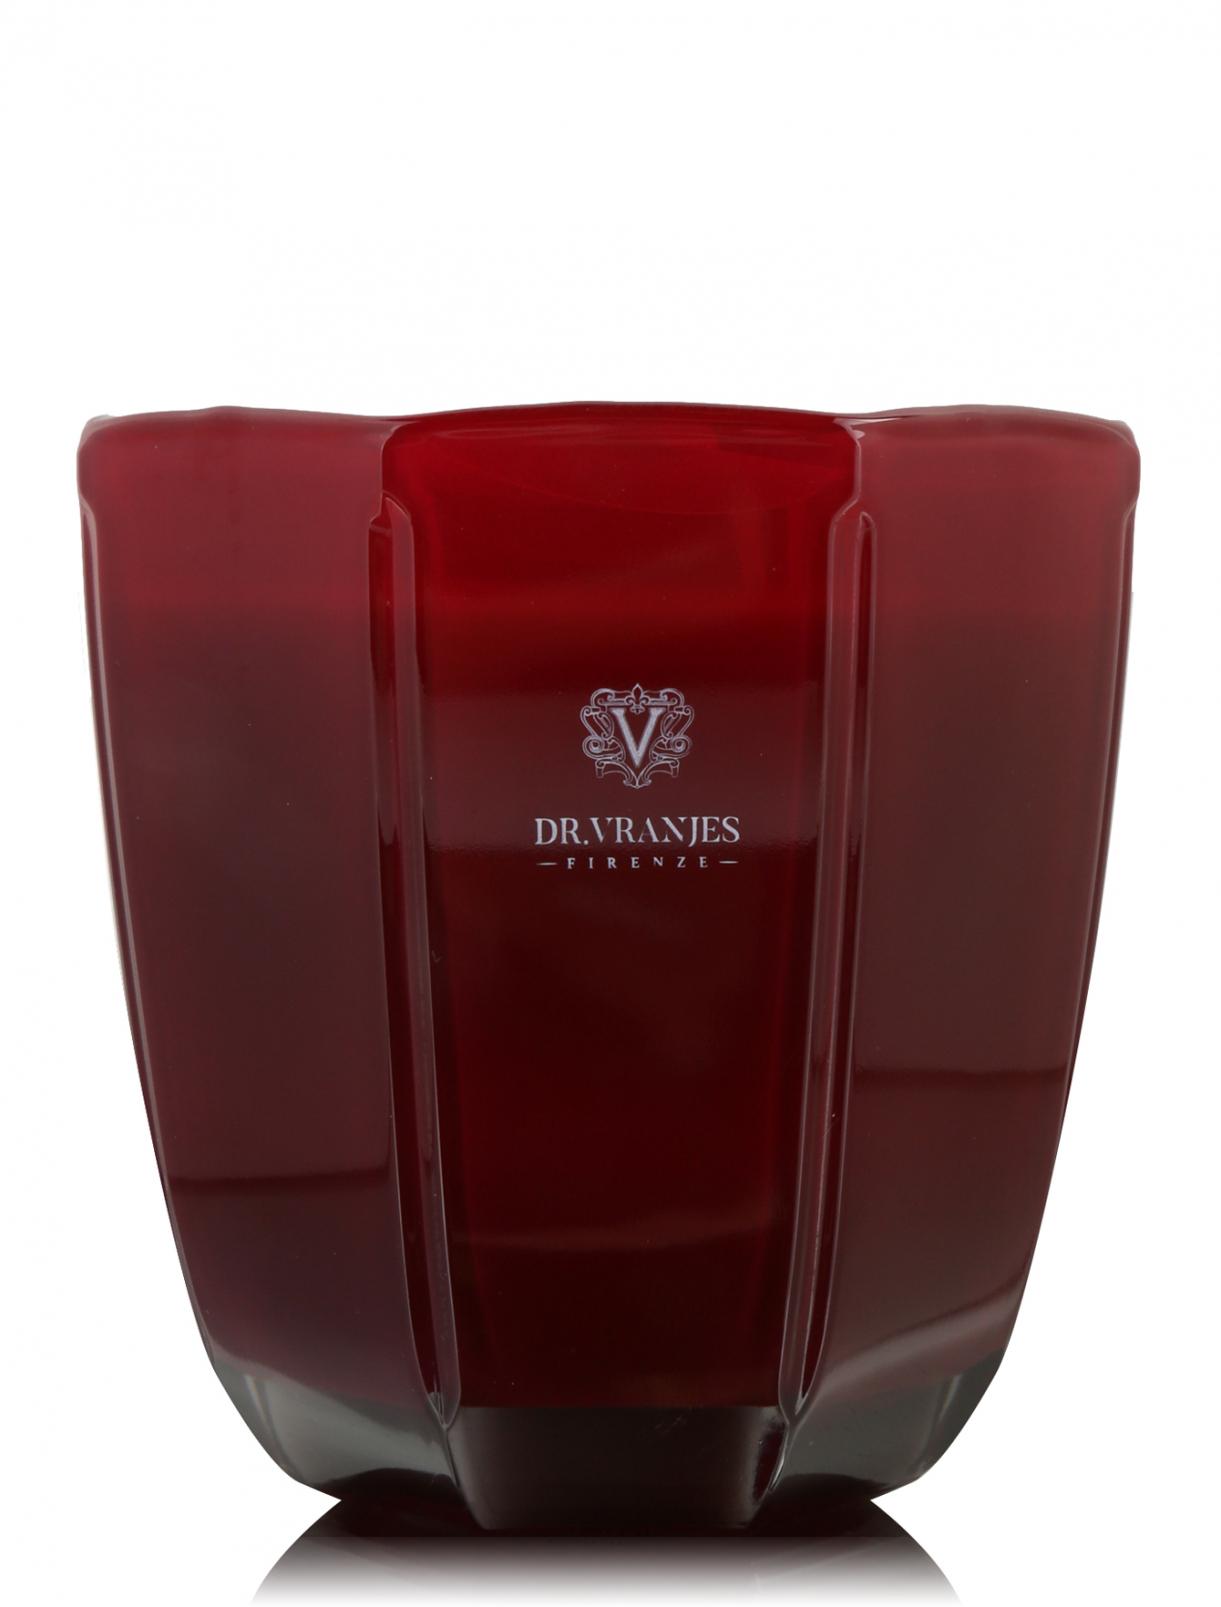 Ароматическая свеча Oud Nobile 500 г Red Tourmaline Home Fragrance Dr. Vranjes  –  Общий вид